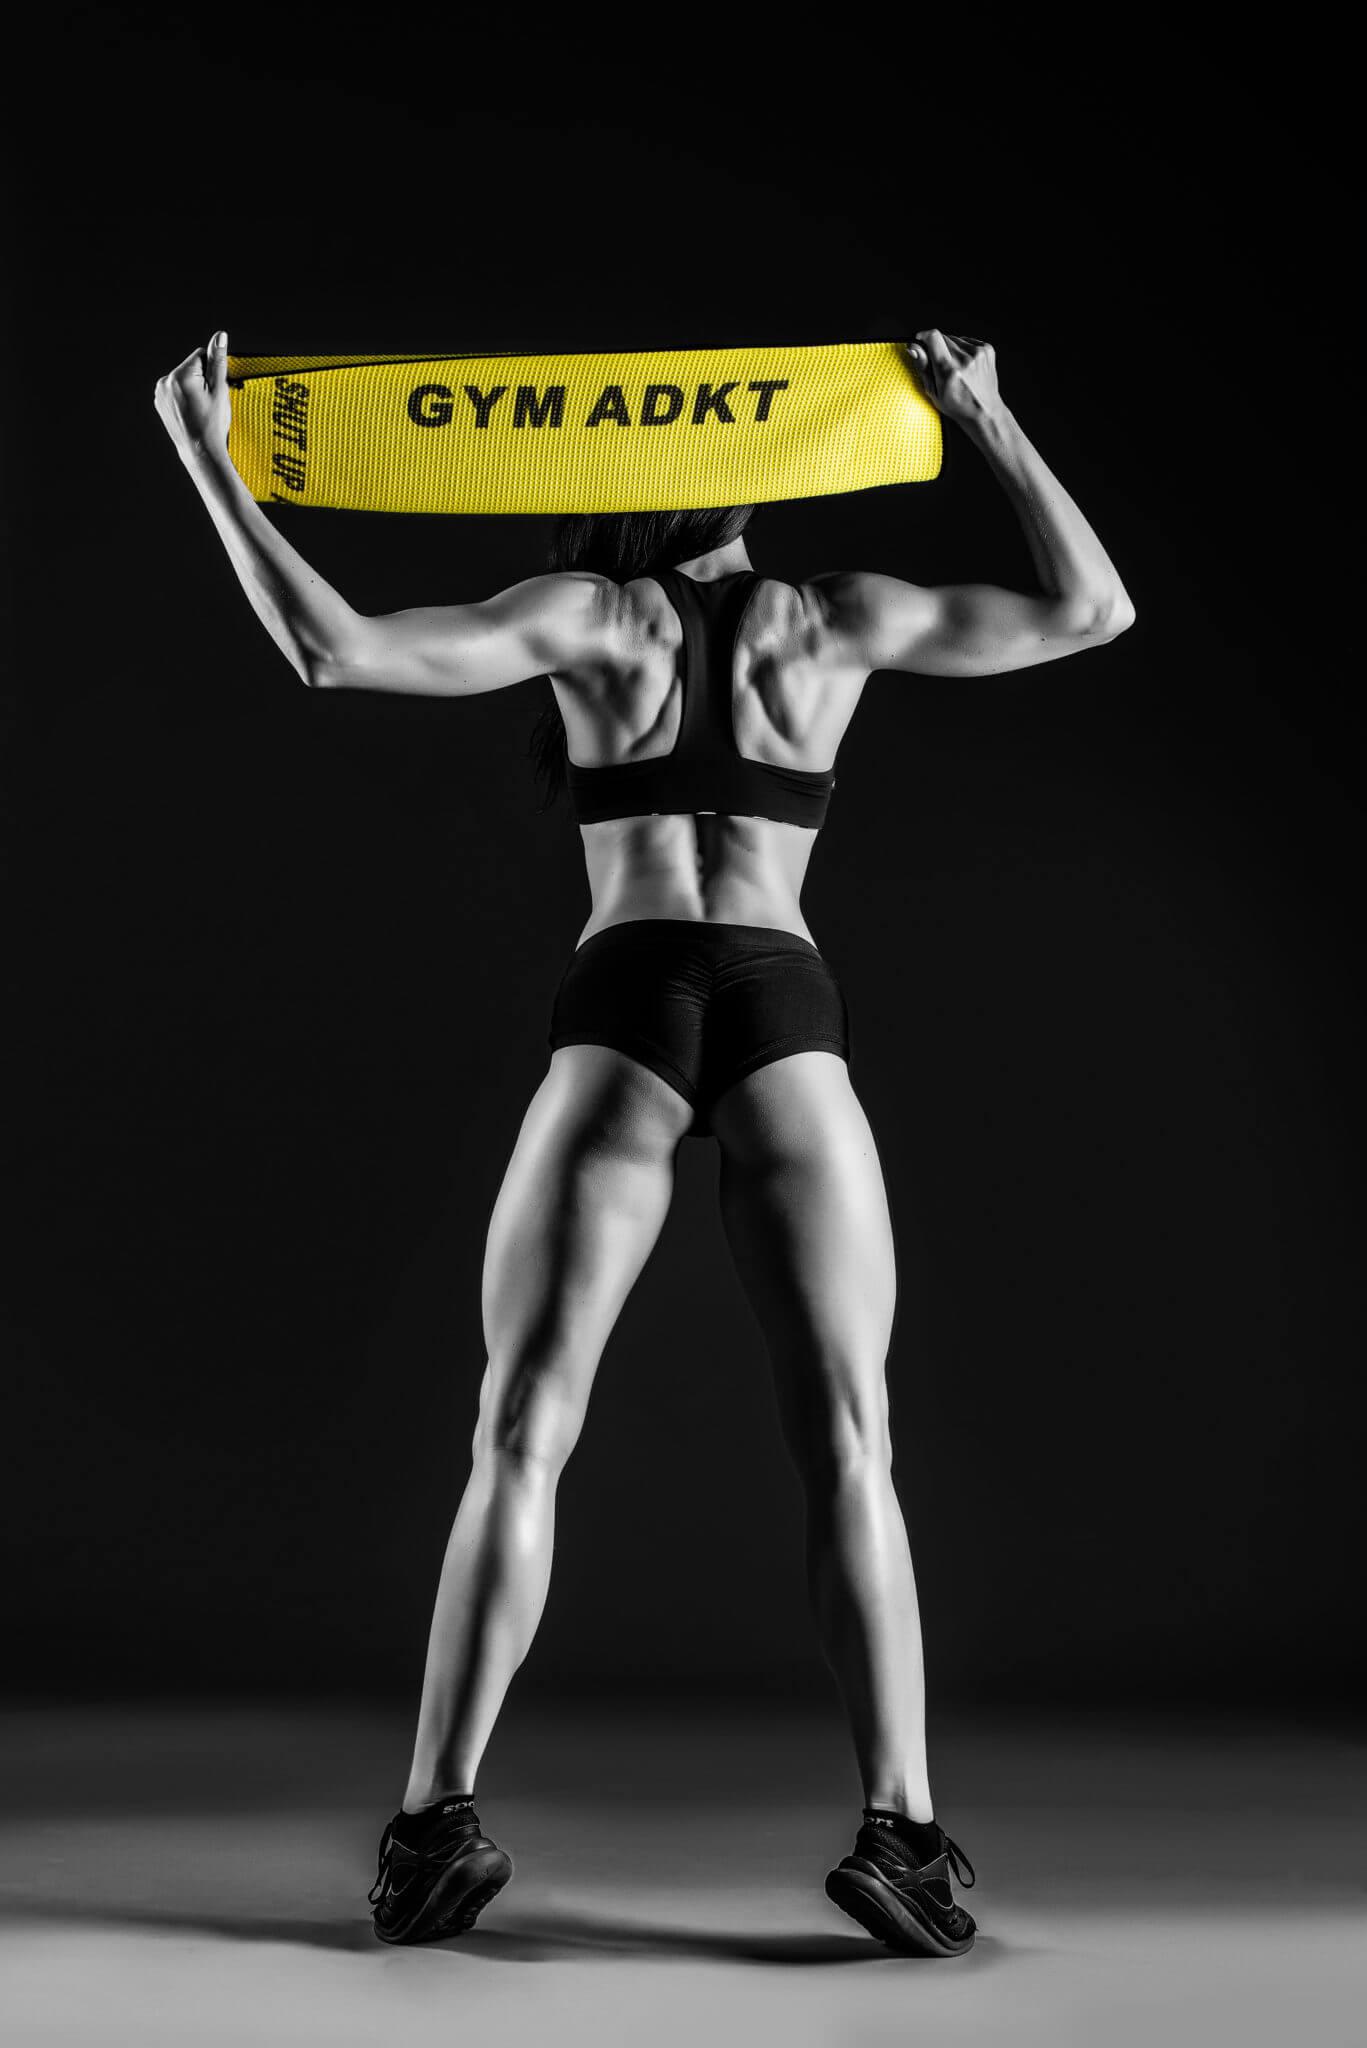 Рекламная съемка для бренда GYM ADKT, ph Постникова, студийная съемка, чб